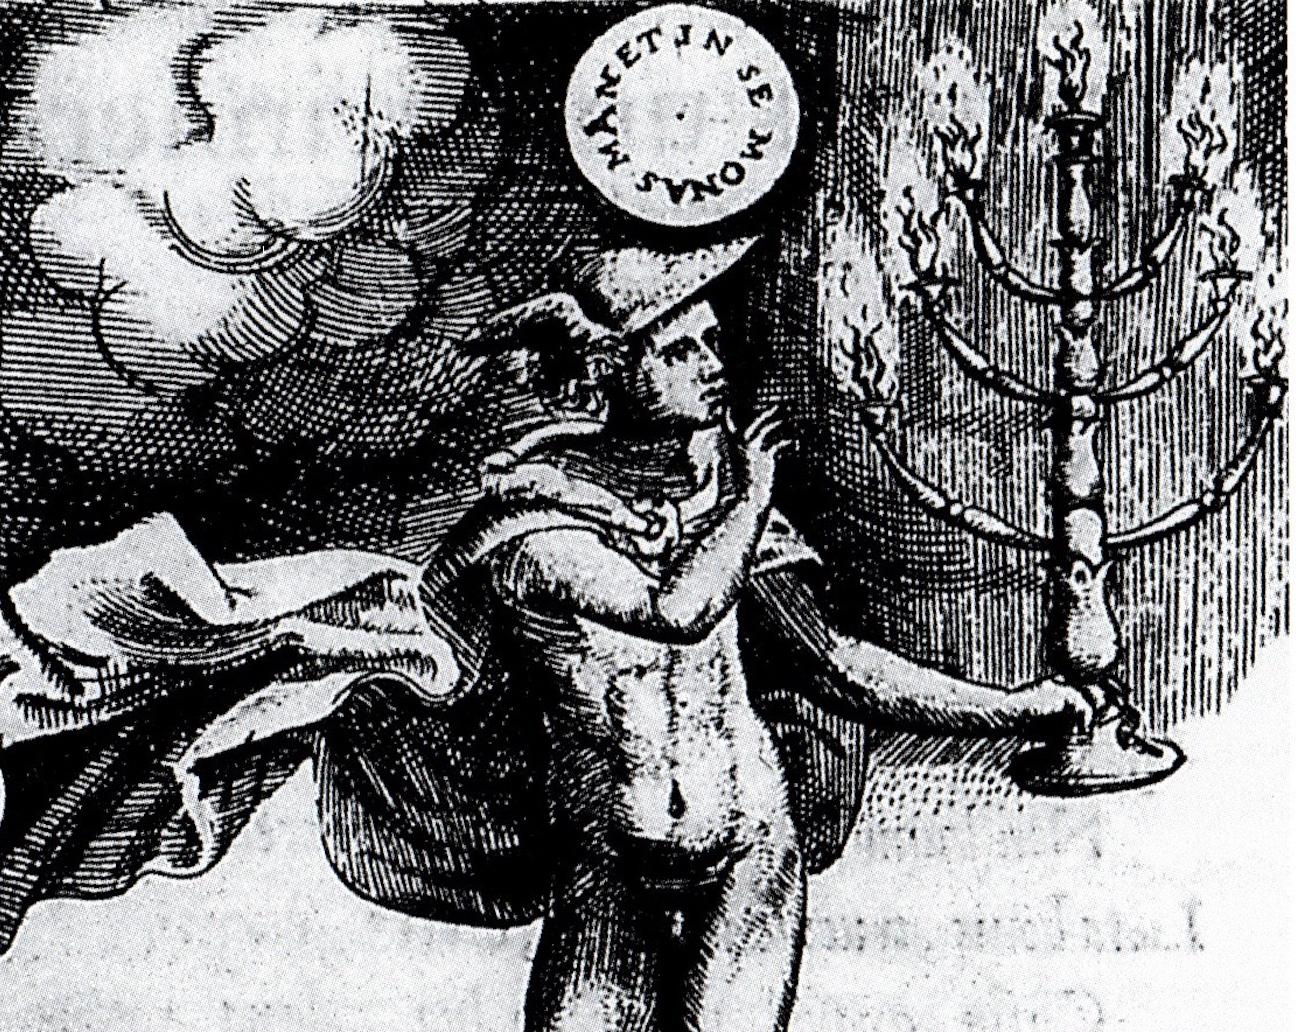 Hermes, the god of speech, urges silence. Achilles Bocchius, Symbolicarum quæstionum ... Bologna 1555